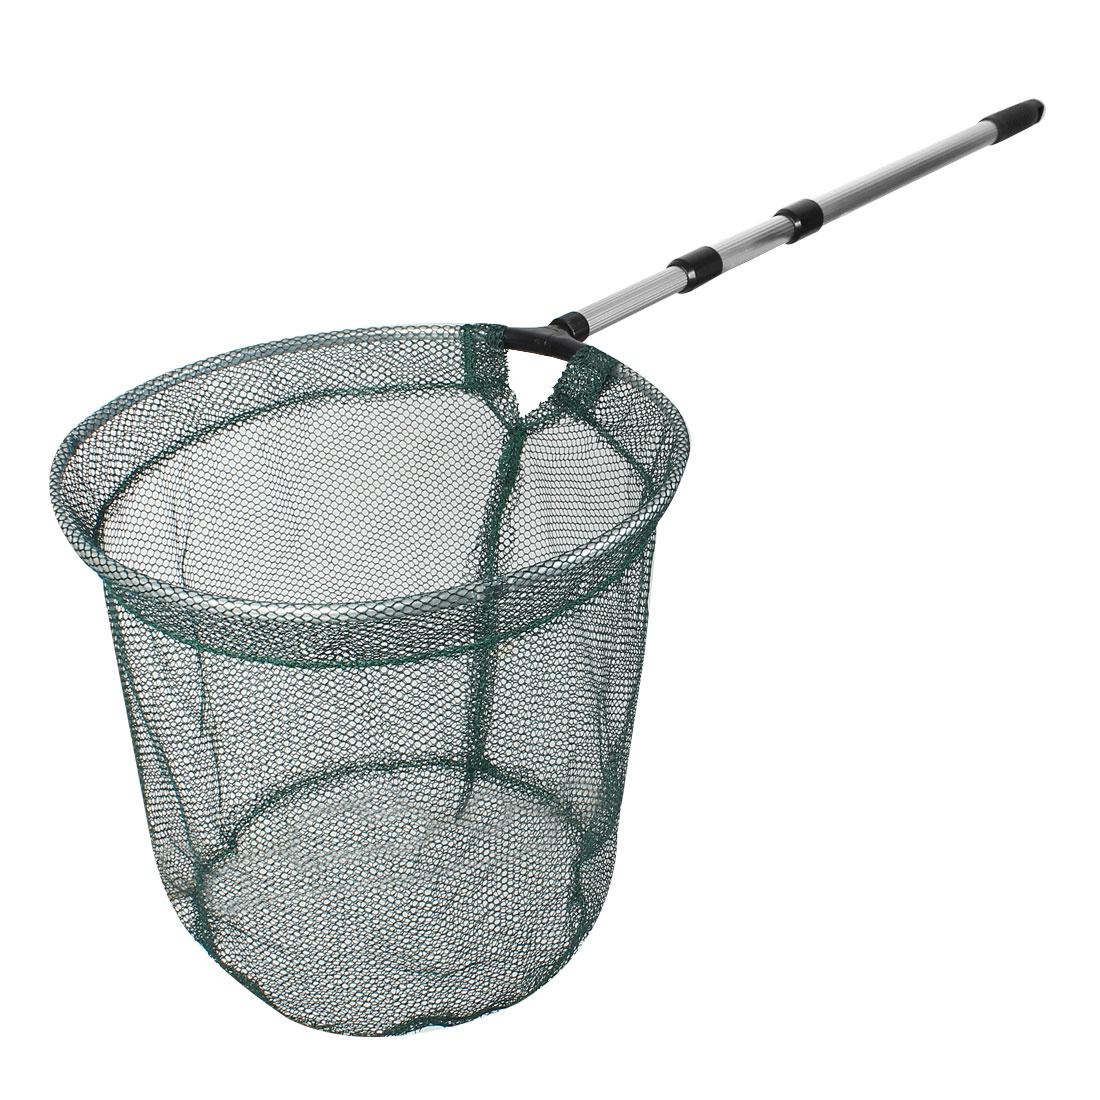 150cm Retractable Pole Folding Fishing Landing Net Extending Handle Tackle